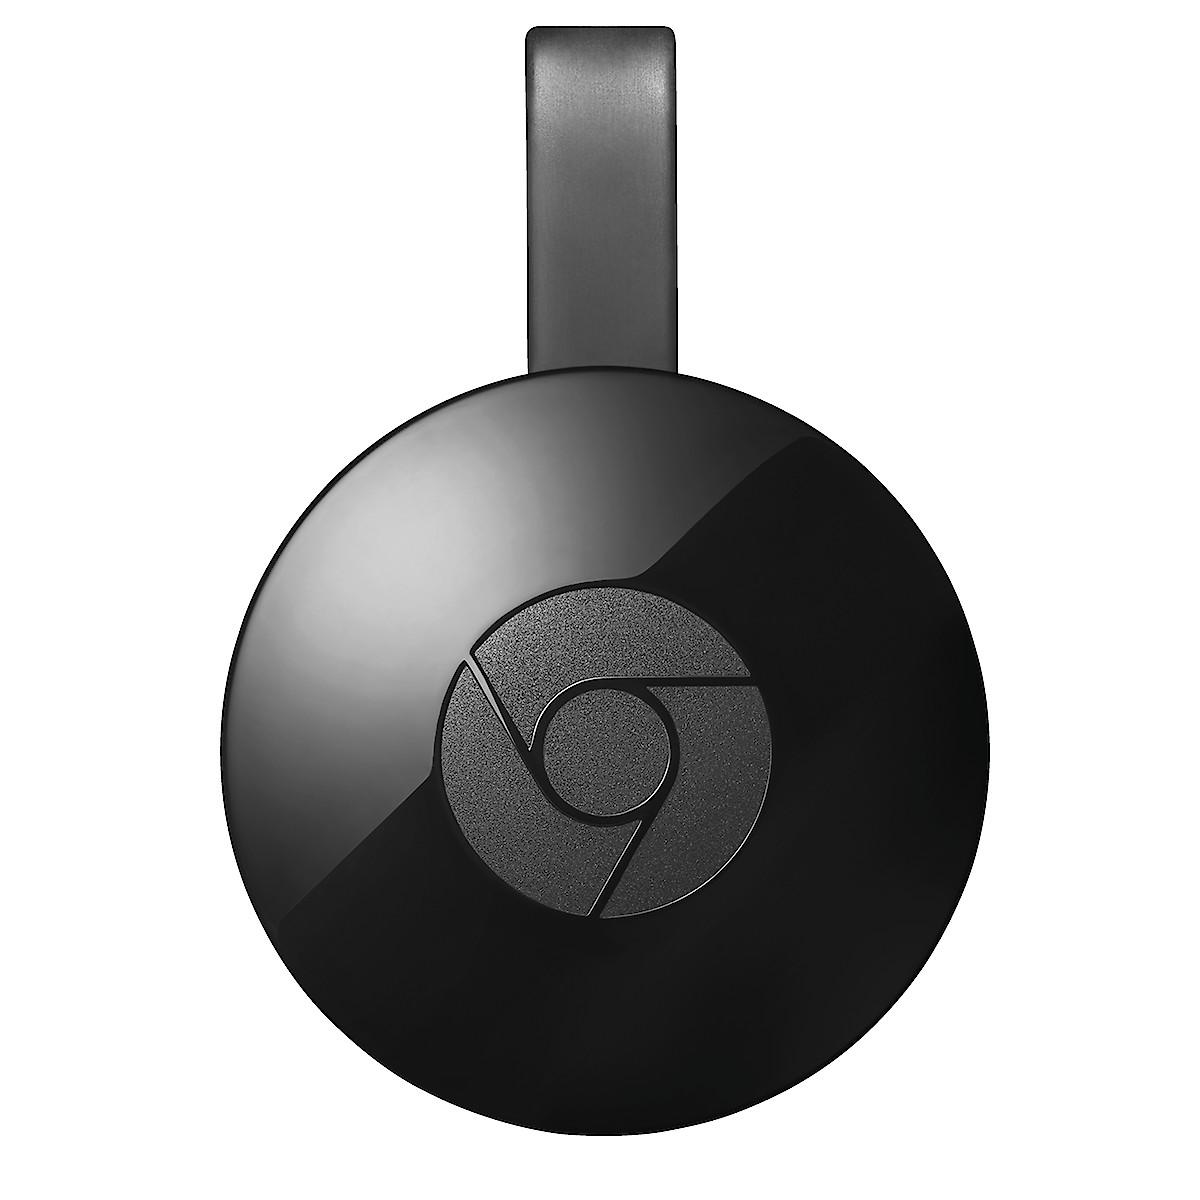 Mediasoitin Google Chromecast